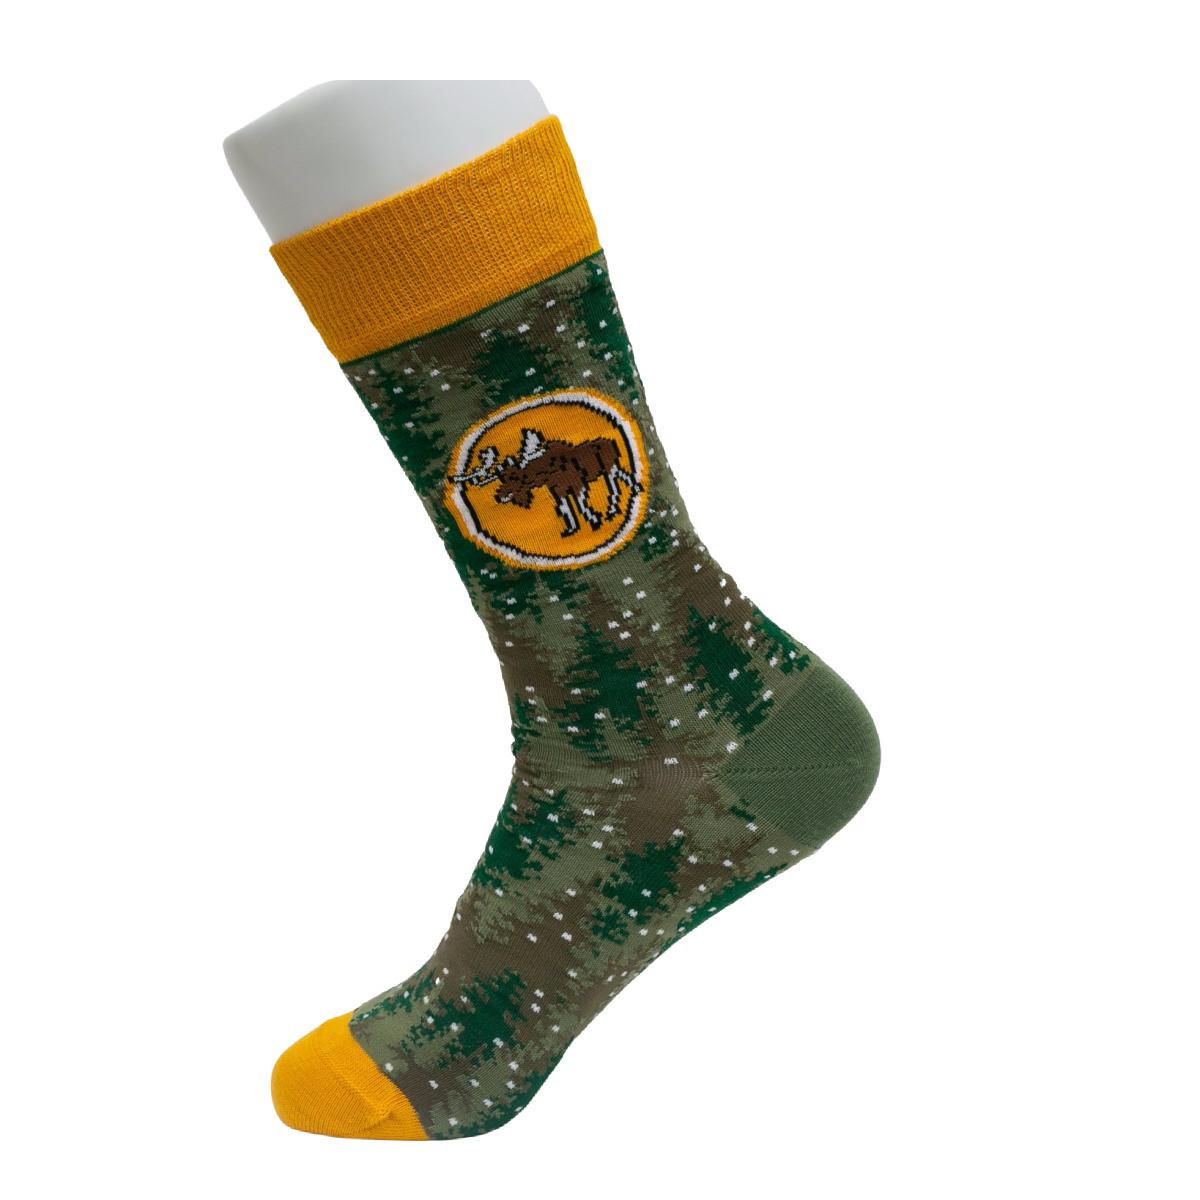 Socks Atomica Socks Atomica Moose On The Loose